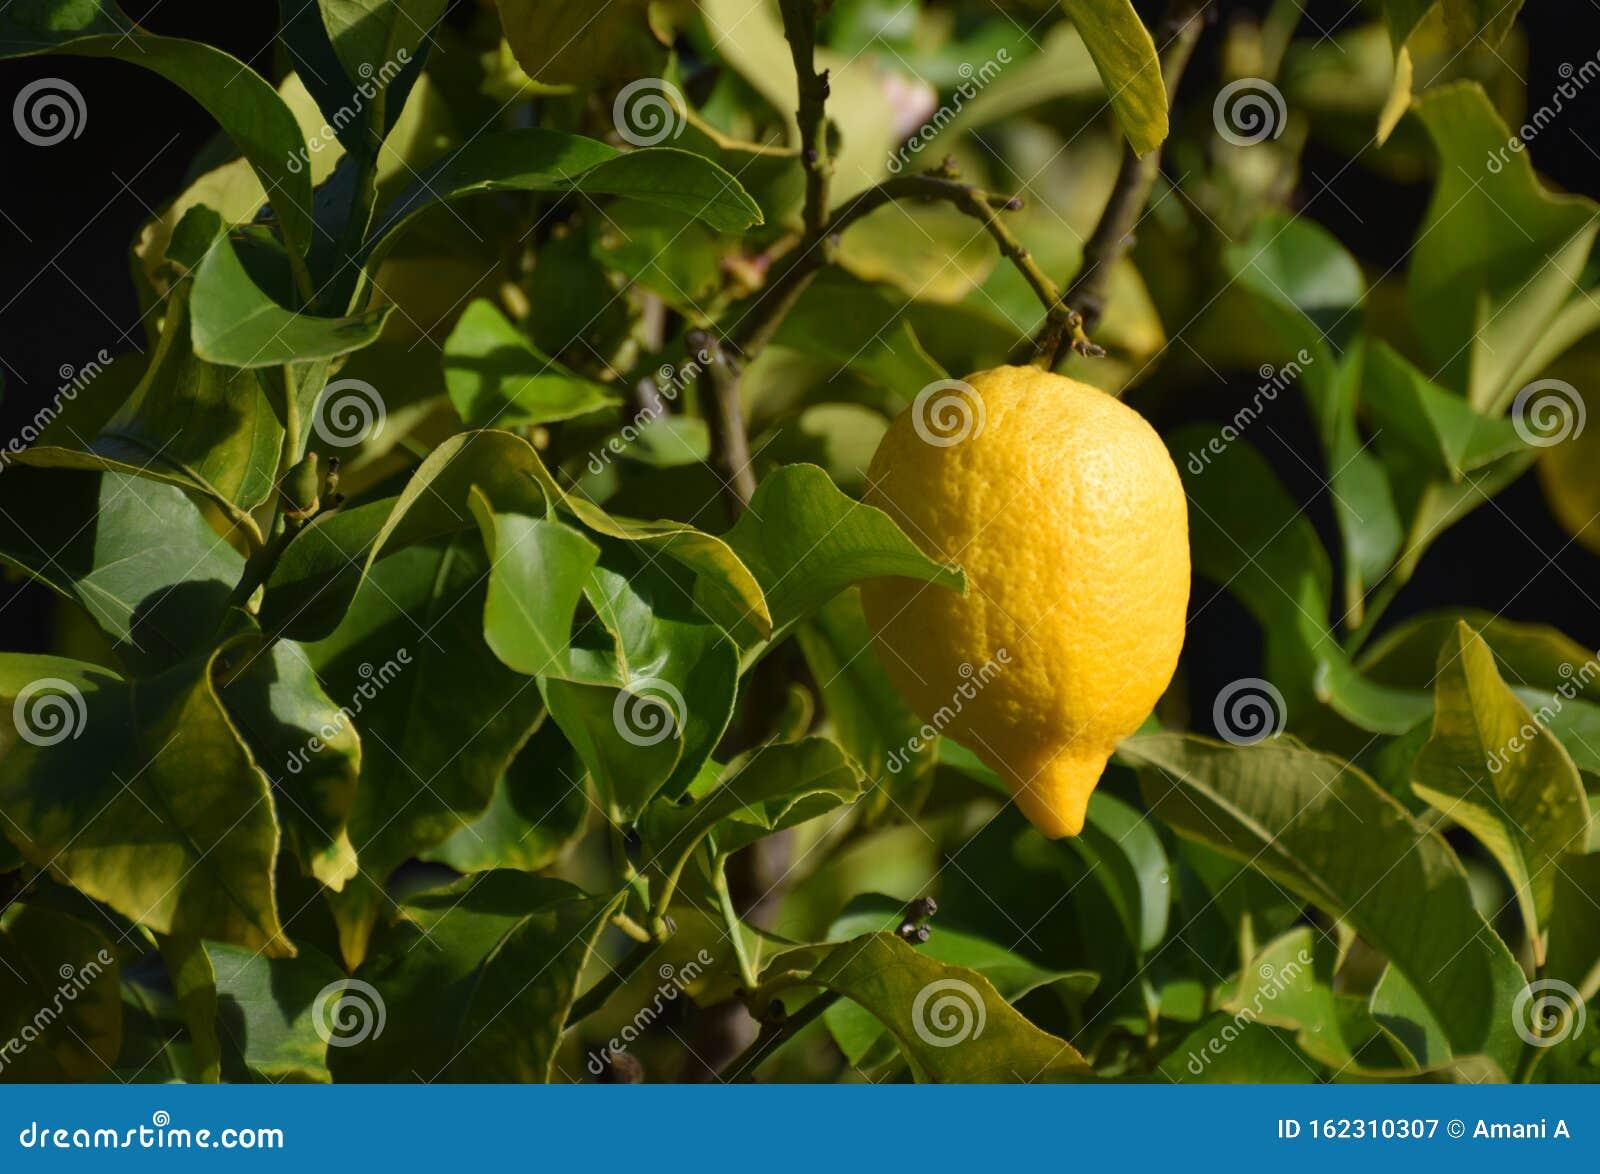 Ripe lemon hanging on a tree